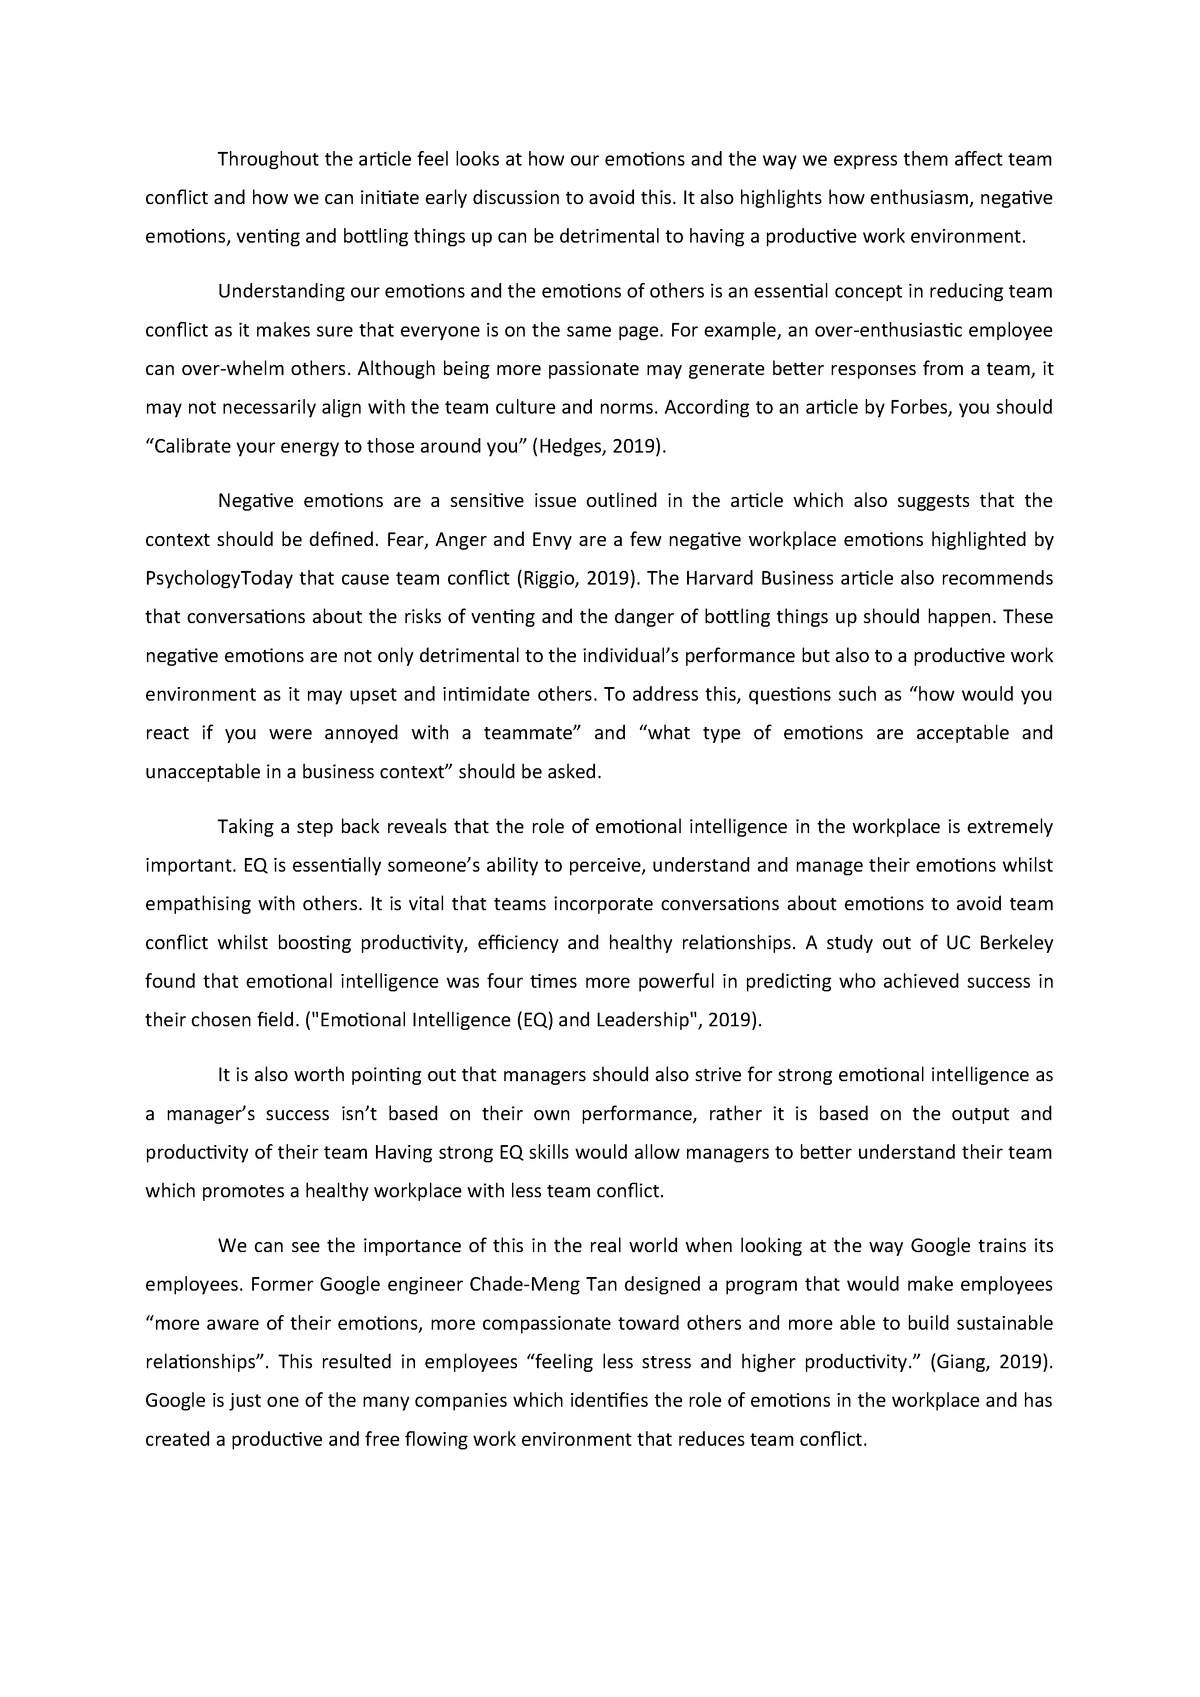 Group presentation: Article 2 - BSB115: Management - StuDocu